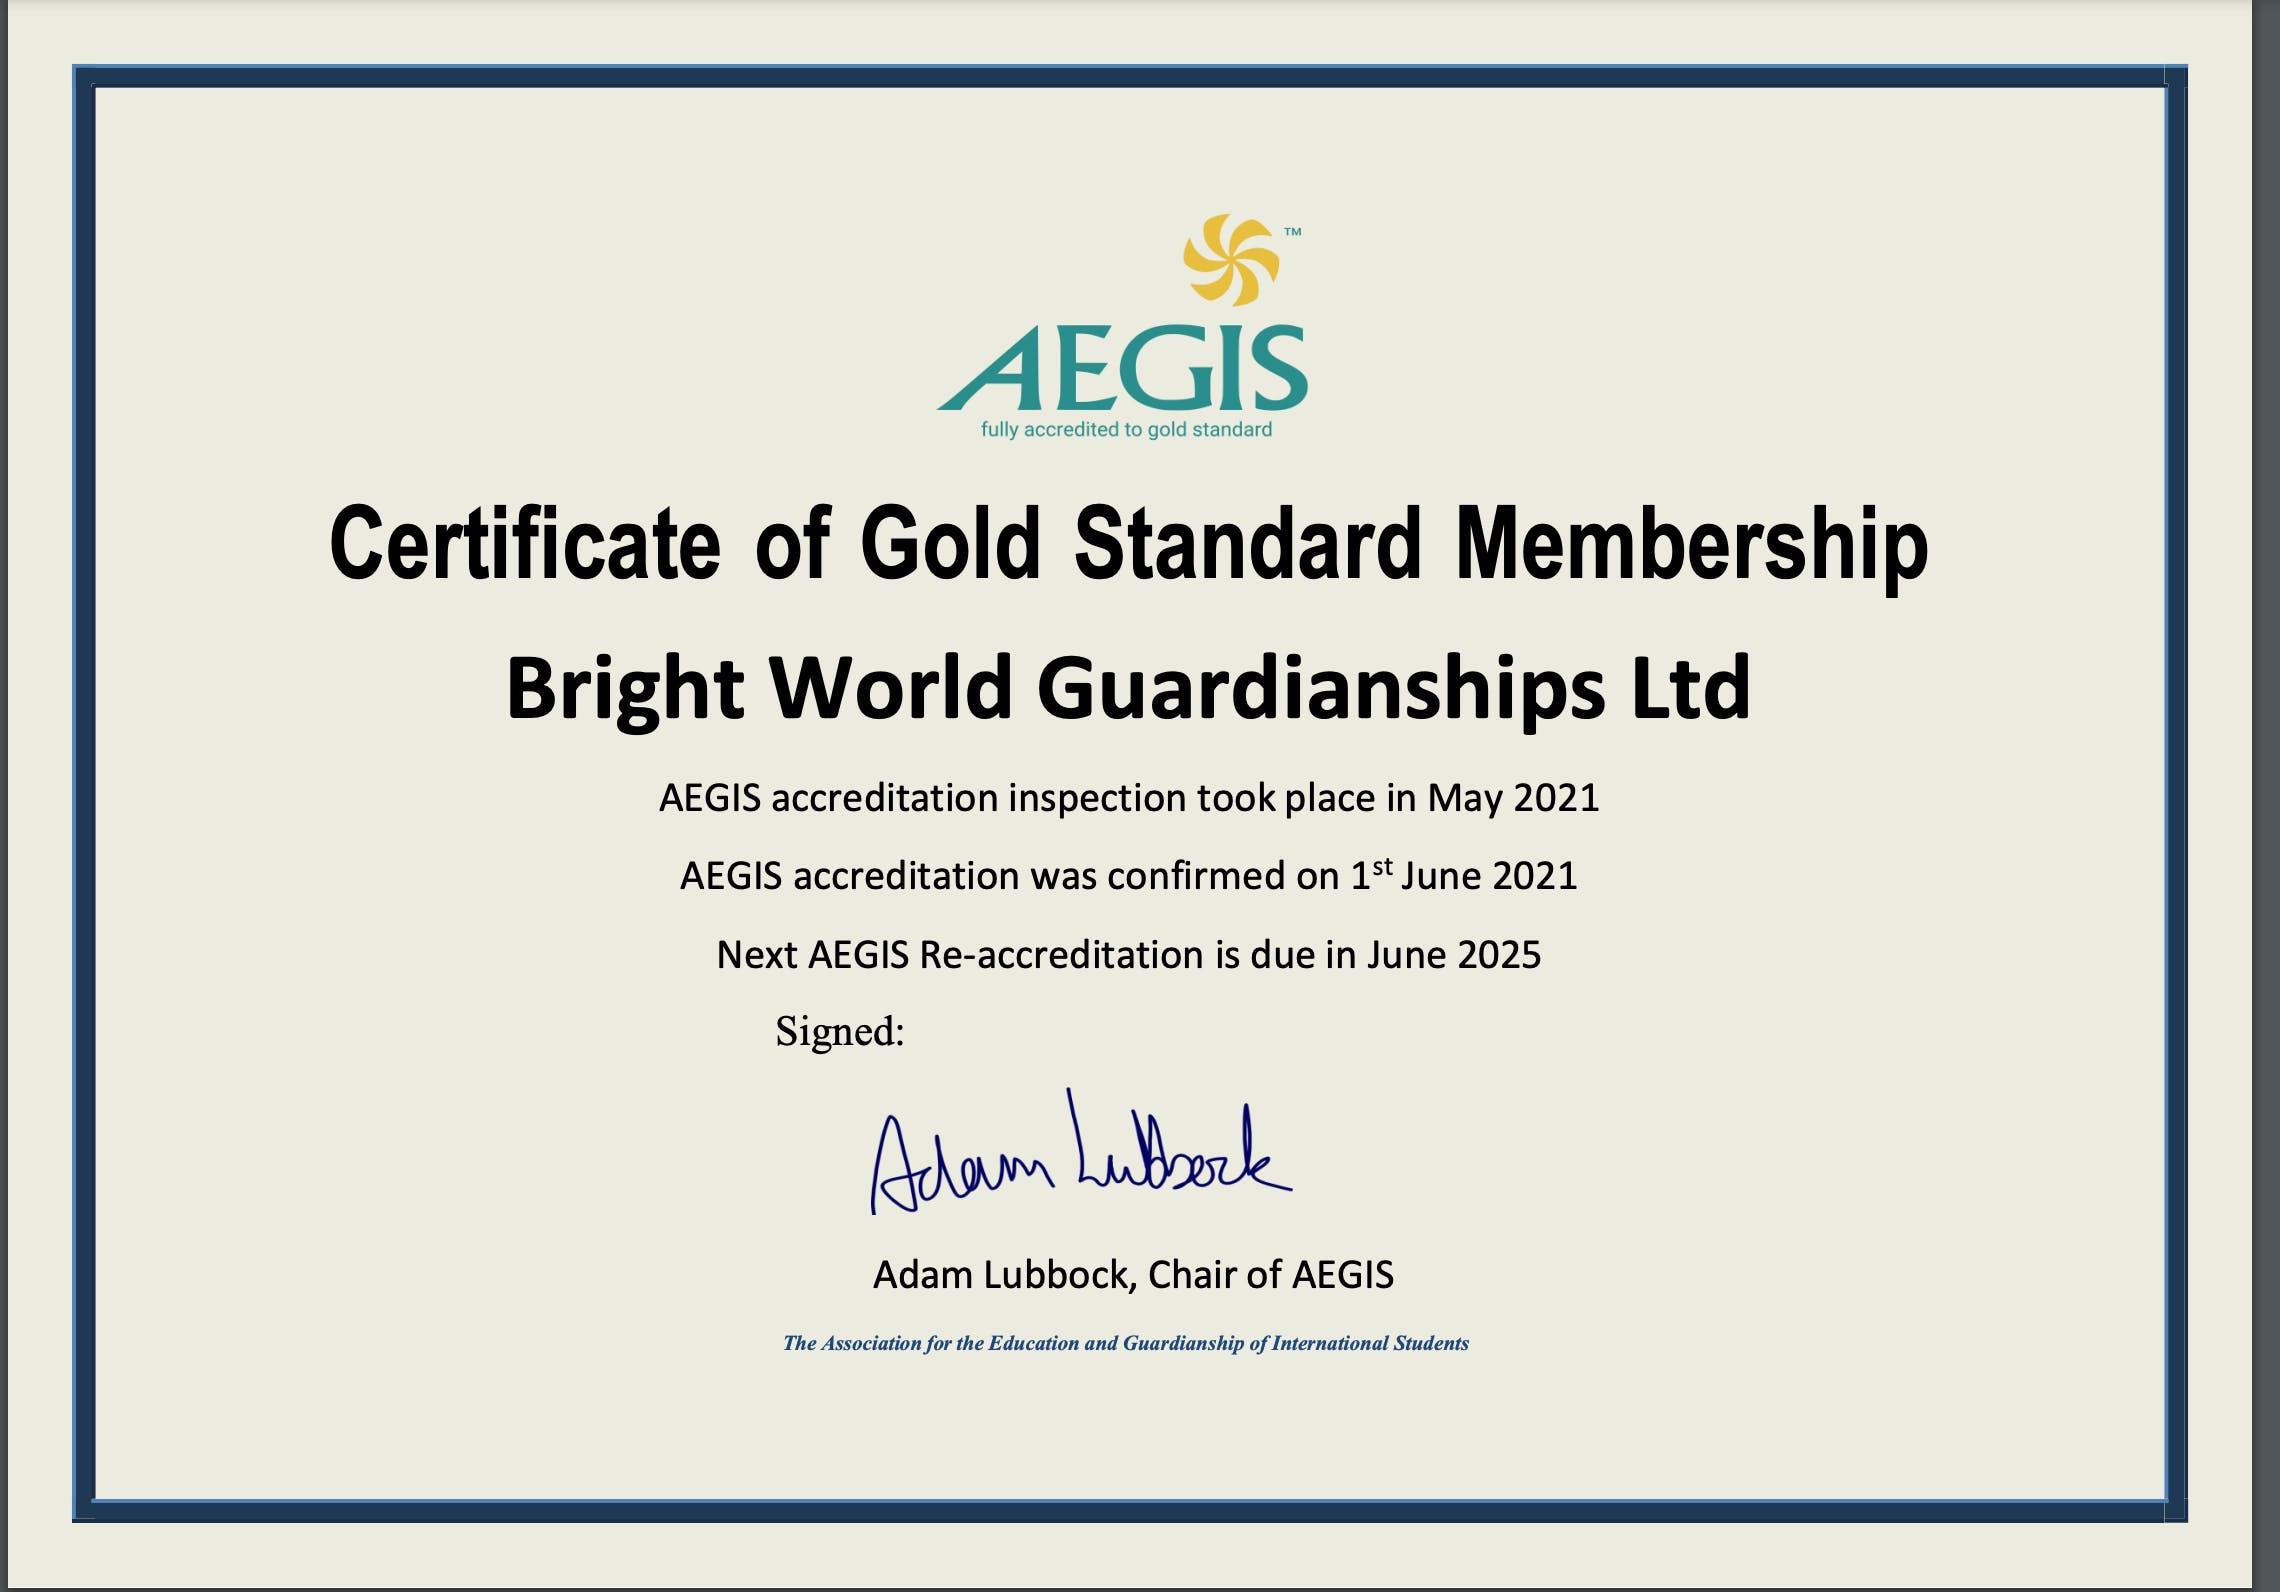 AEGIS re-accrediation certificate